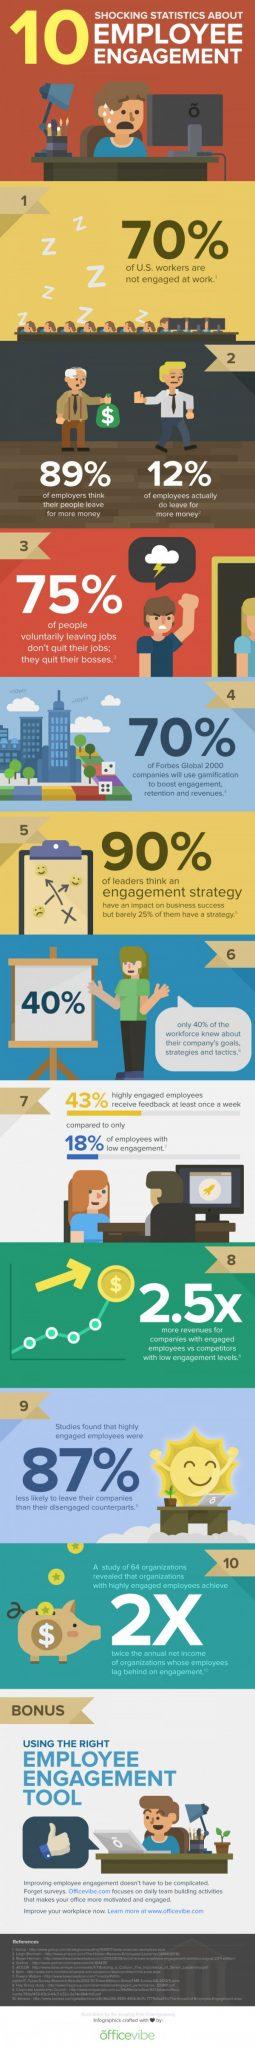 Employee-Engagement-Statistics-Infographic